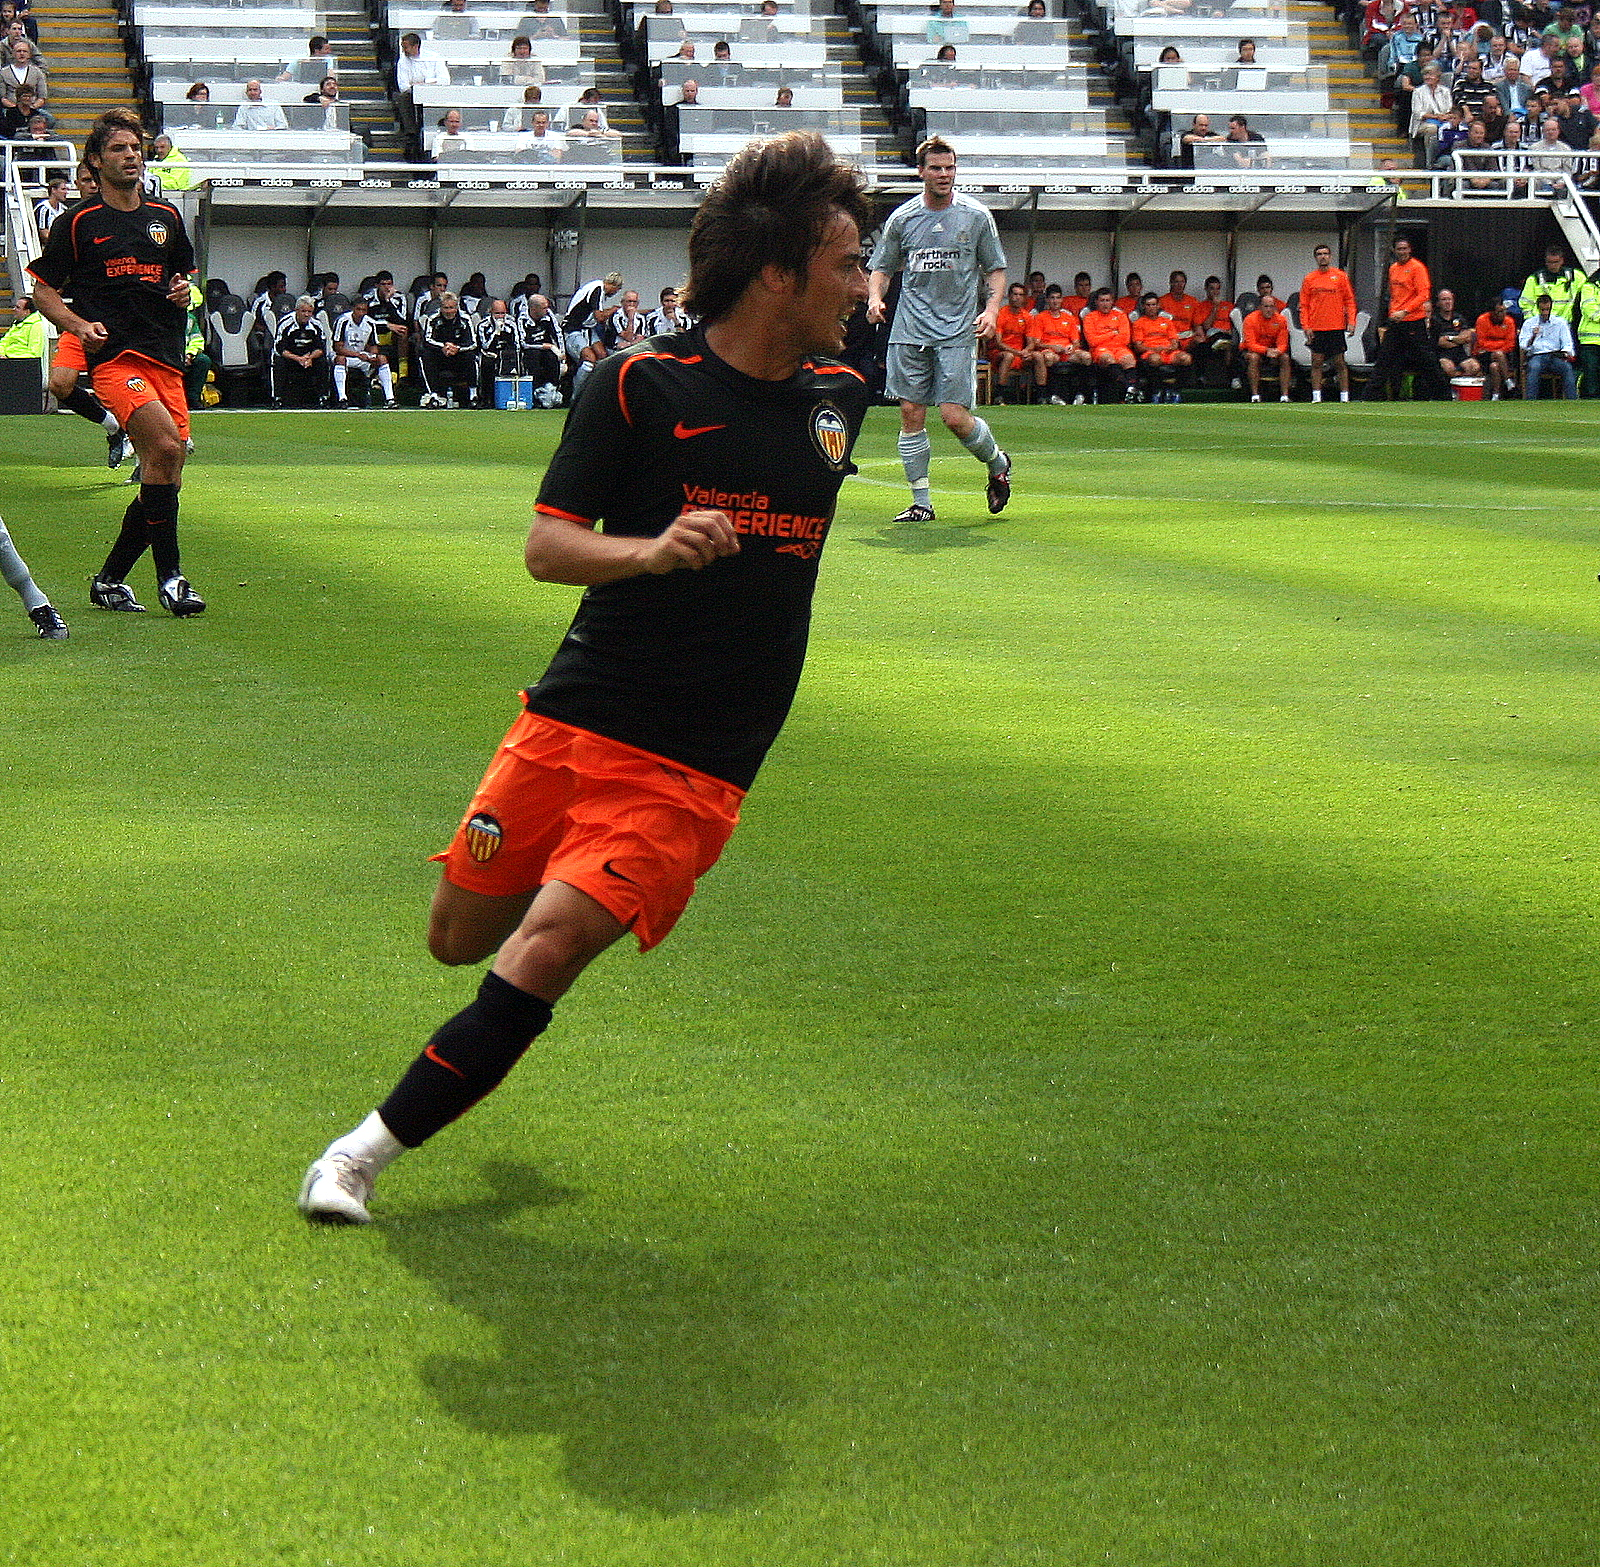 Fotos david silva jugador valencia 15